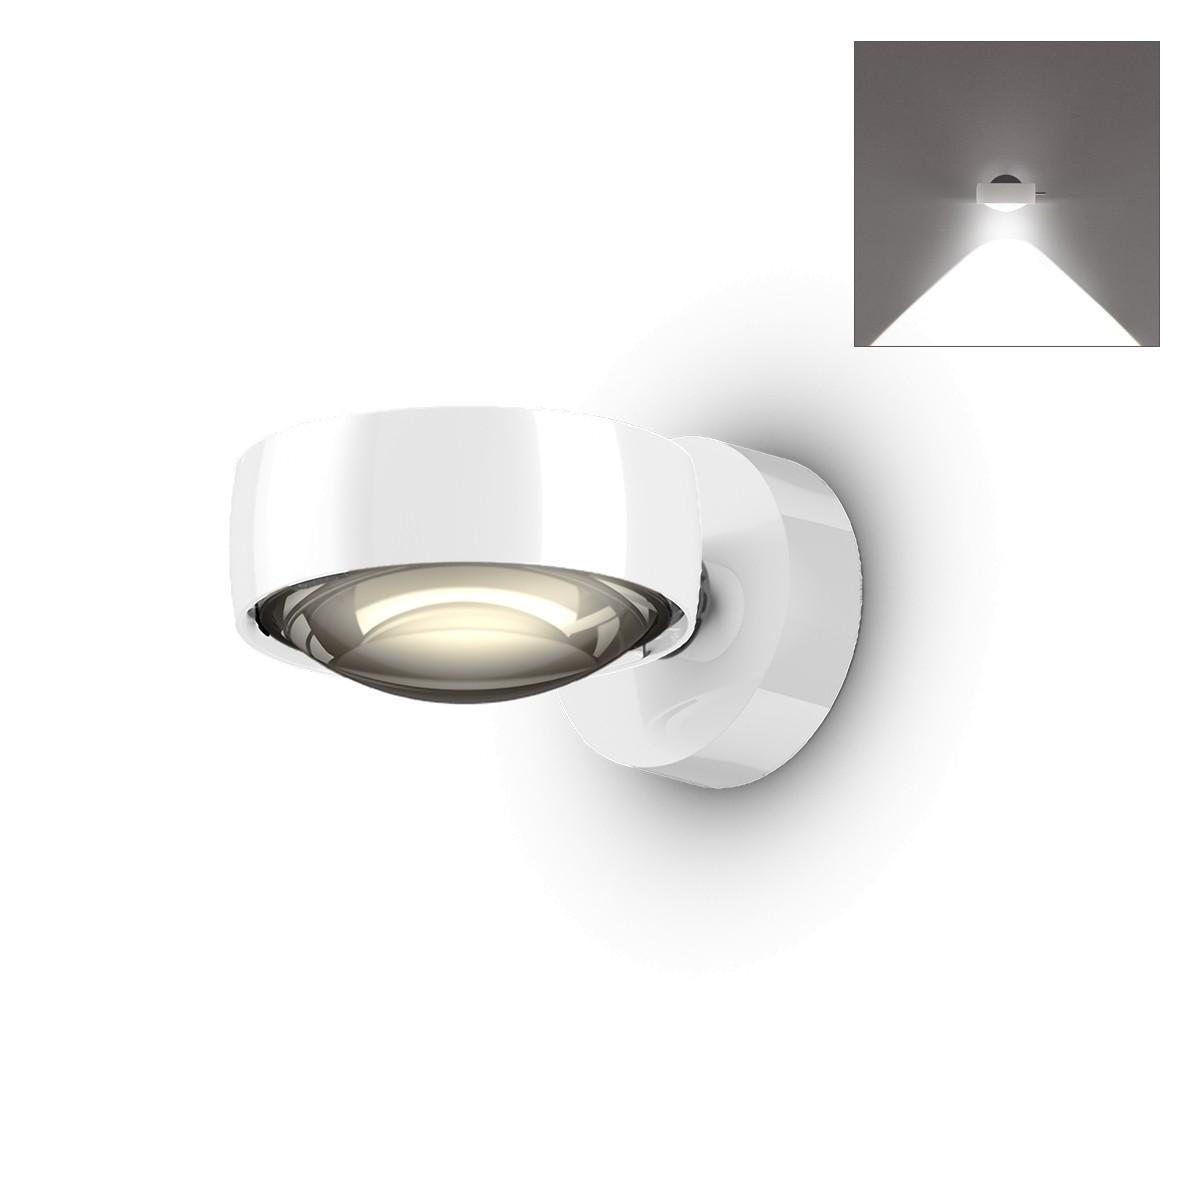 Occhio Sento C LED verticale up Wandleuchte, 18 W / 2700 K, Chrom / weiß glänzend